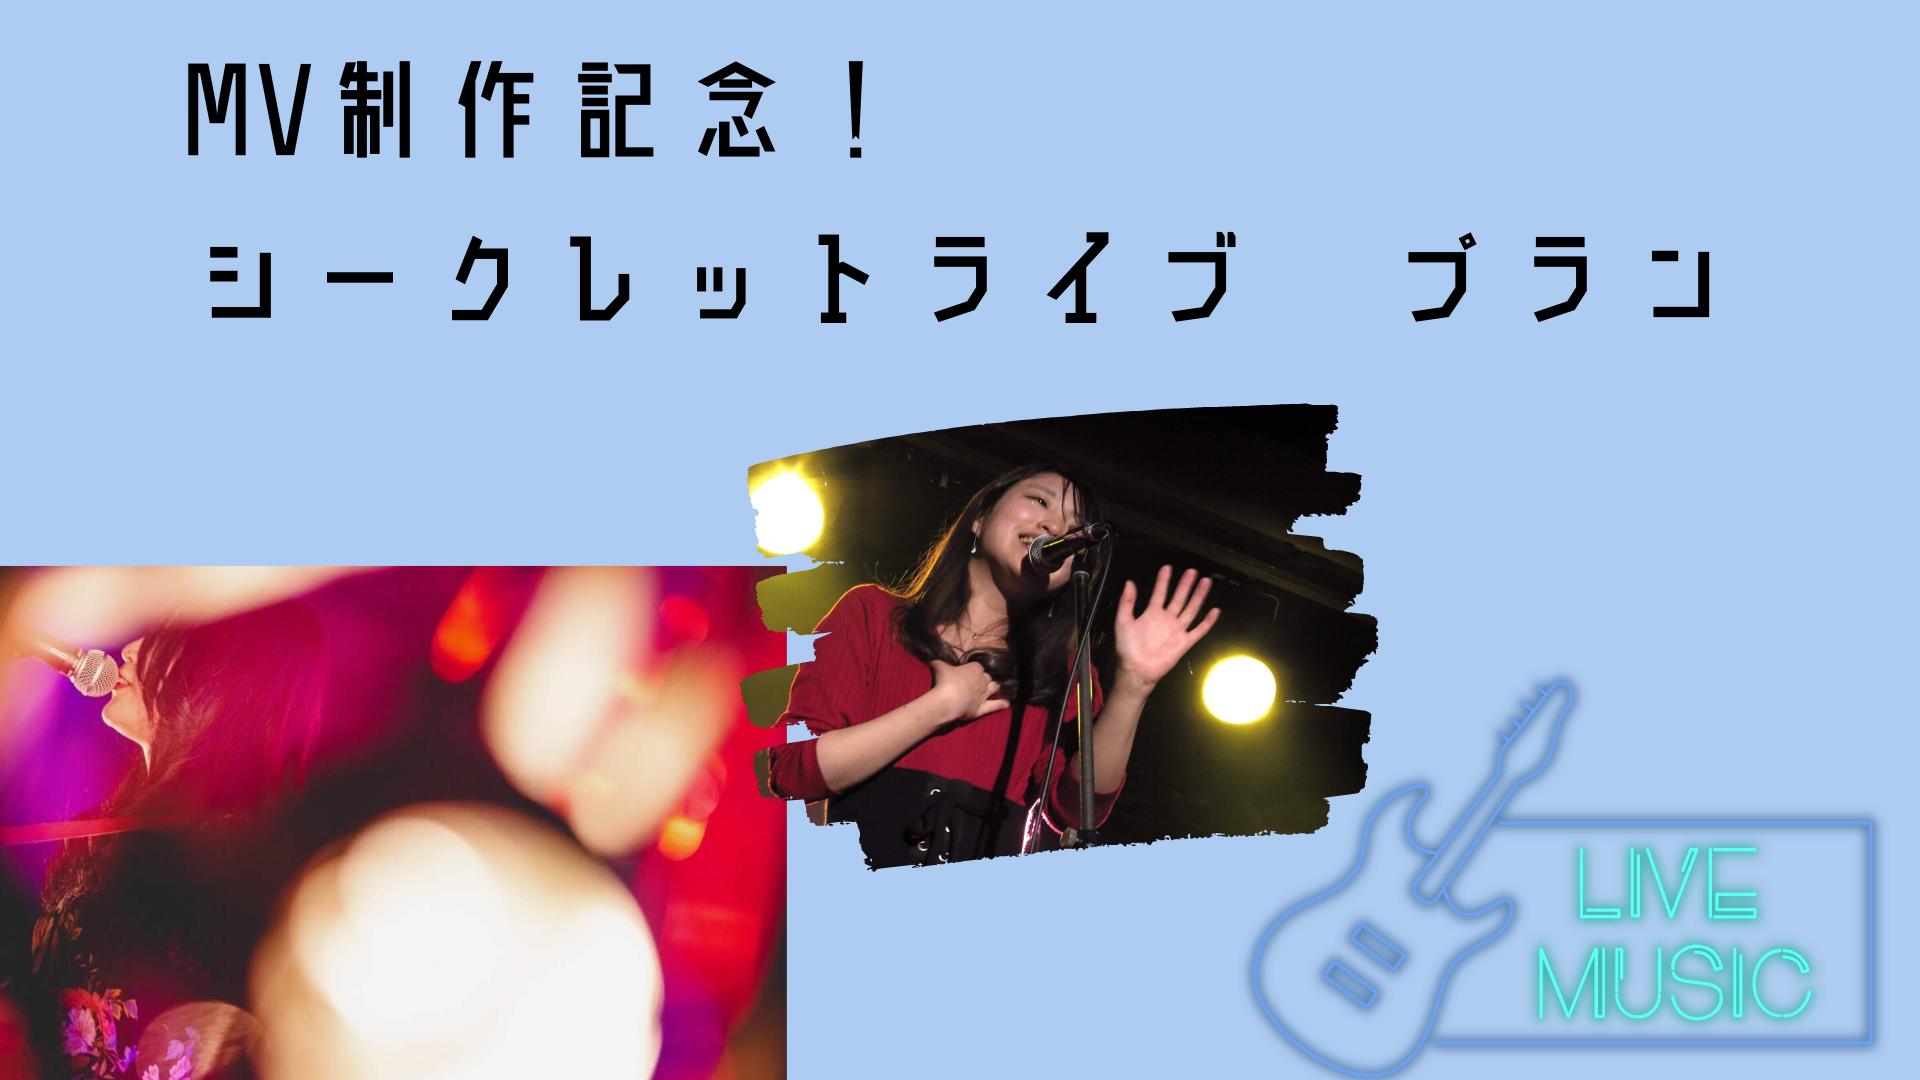 <MV制作記念!シークレットライブ プラン>